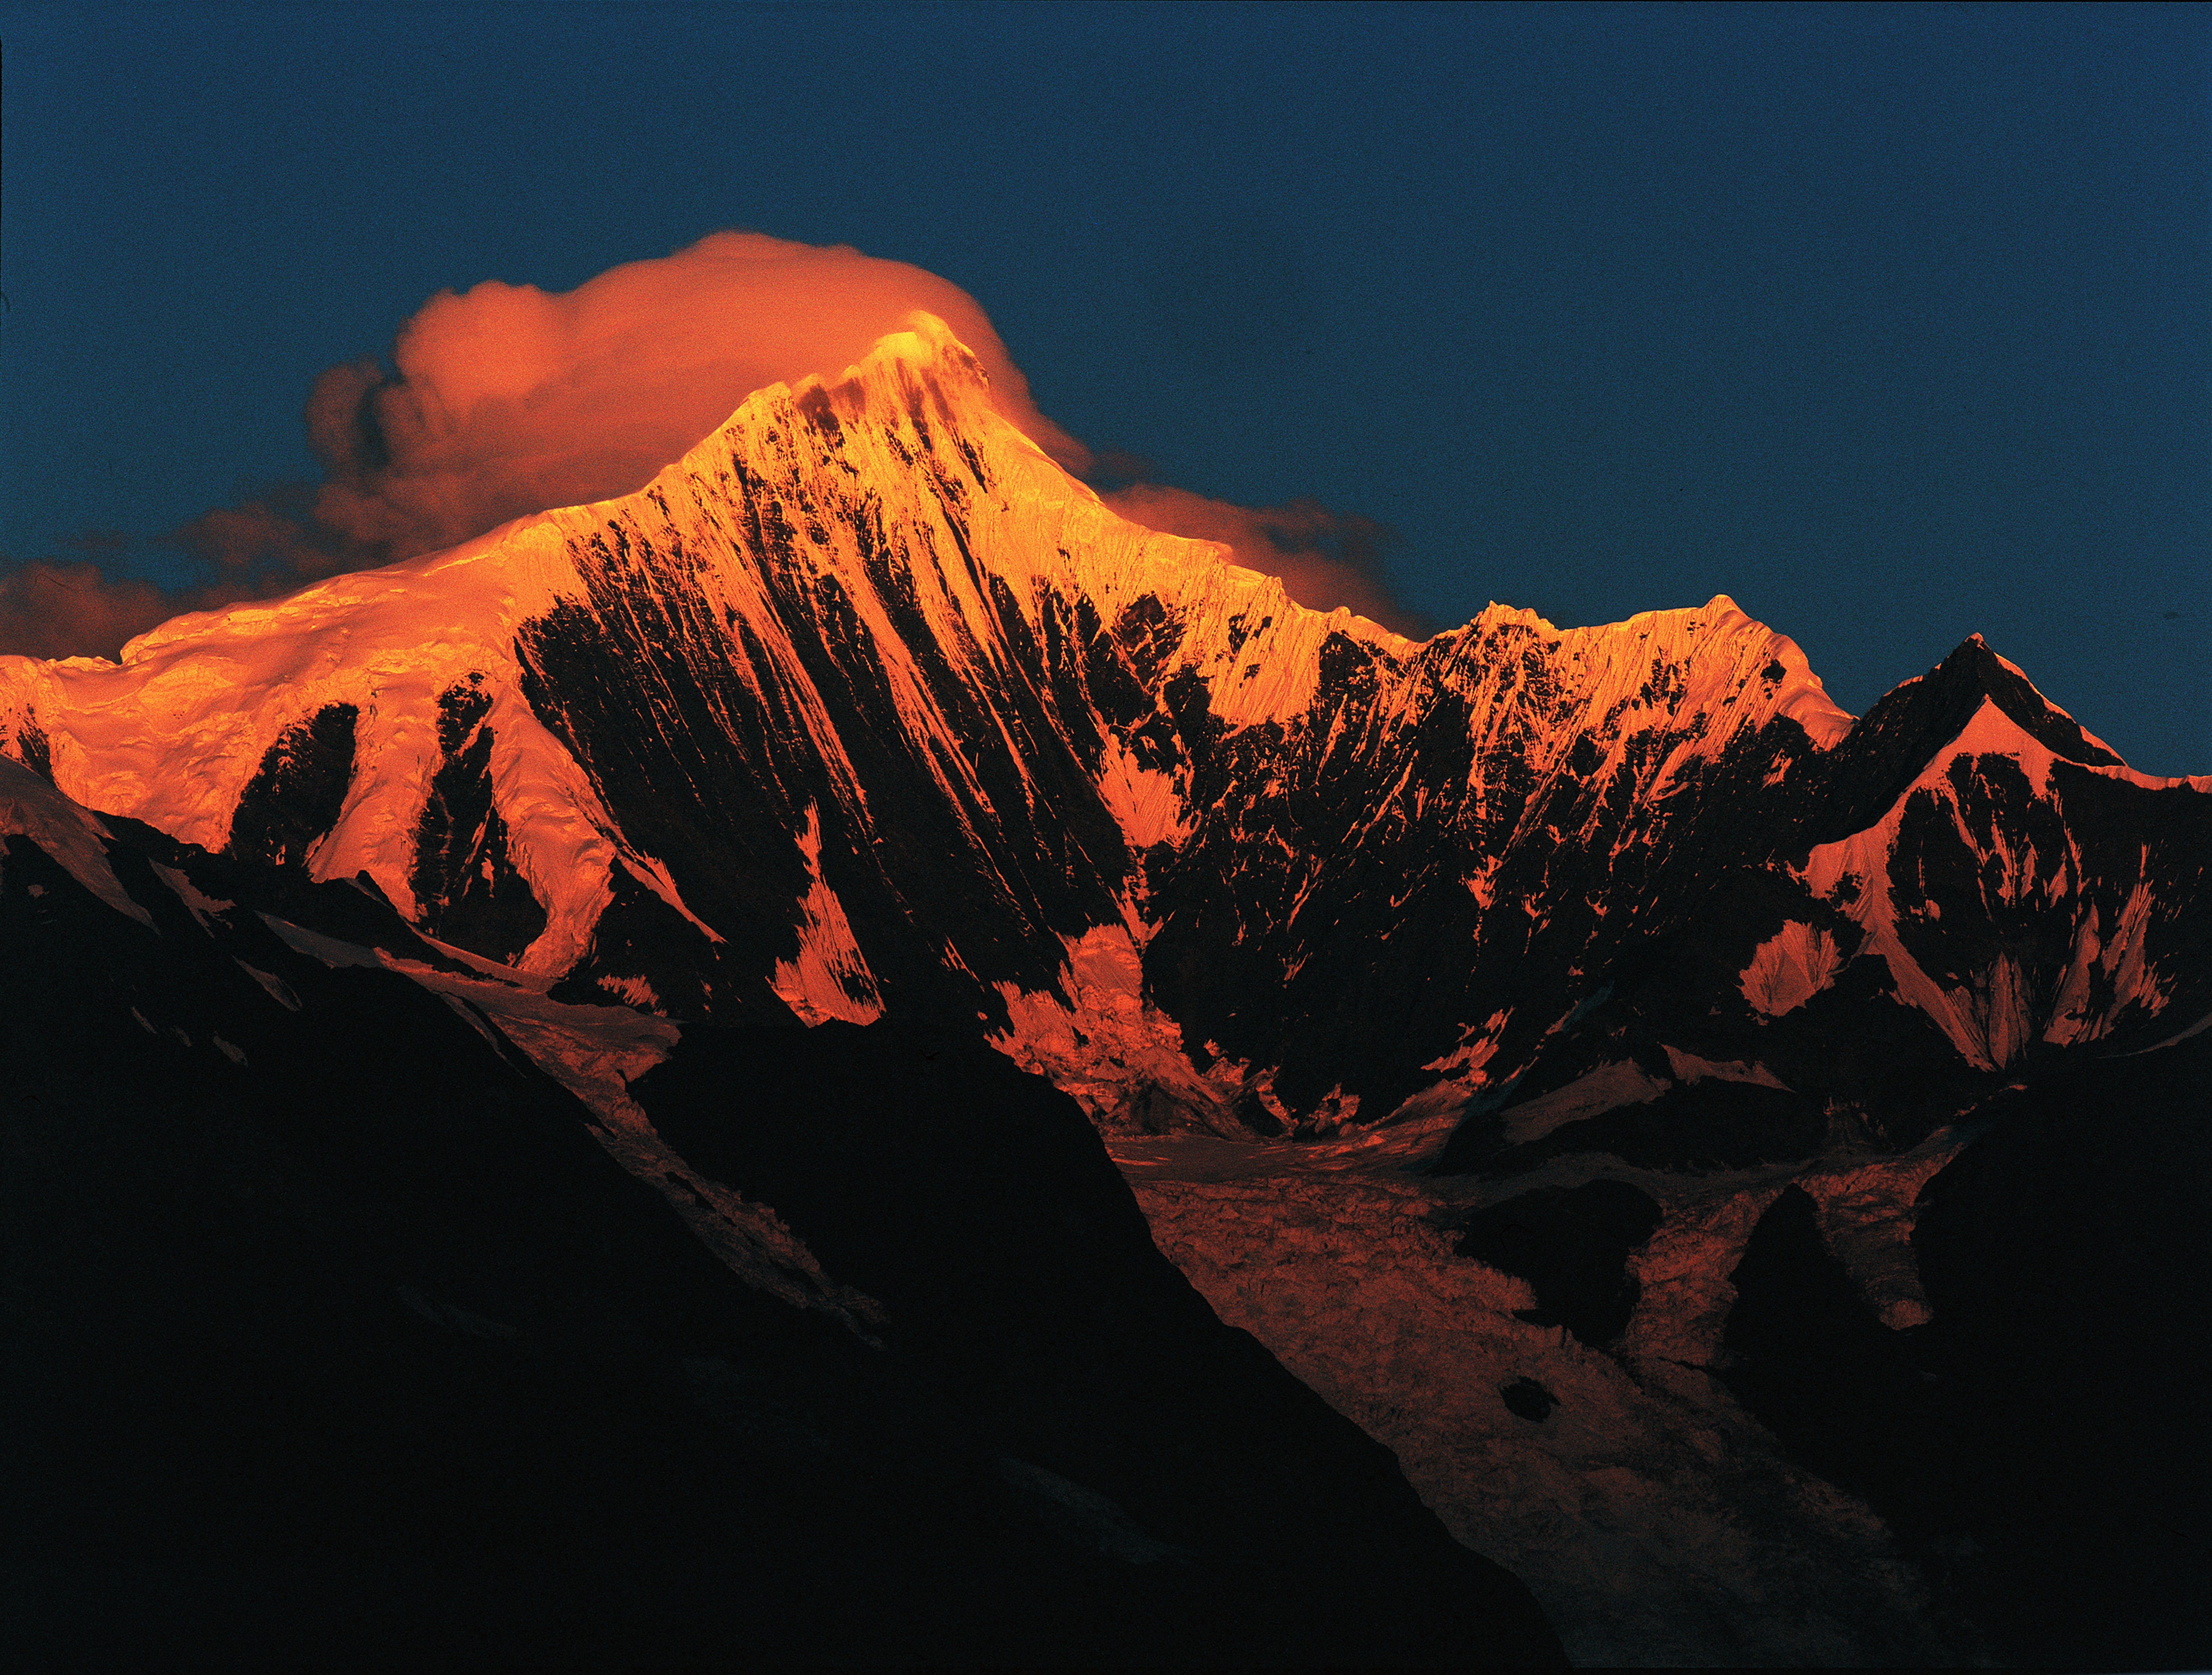 mountain rage view under blue sky